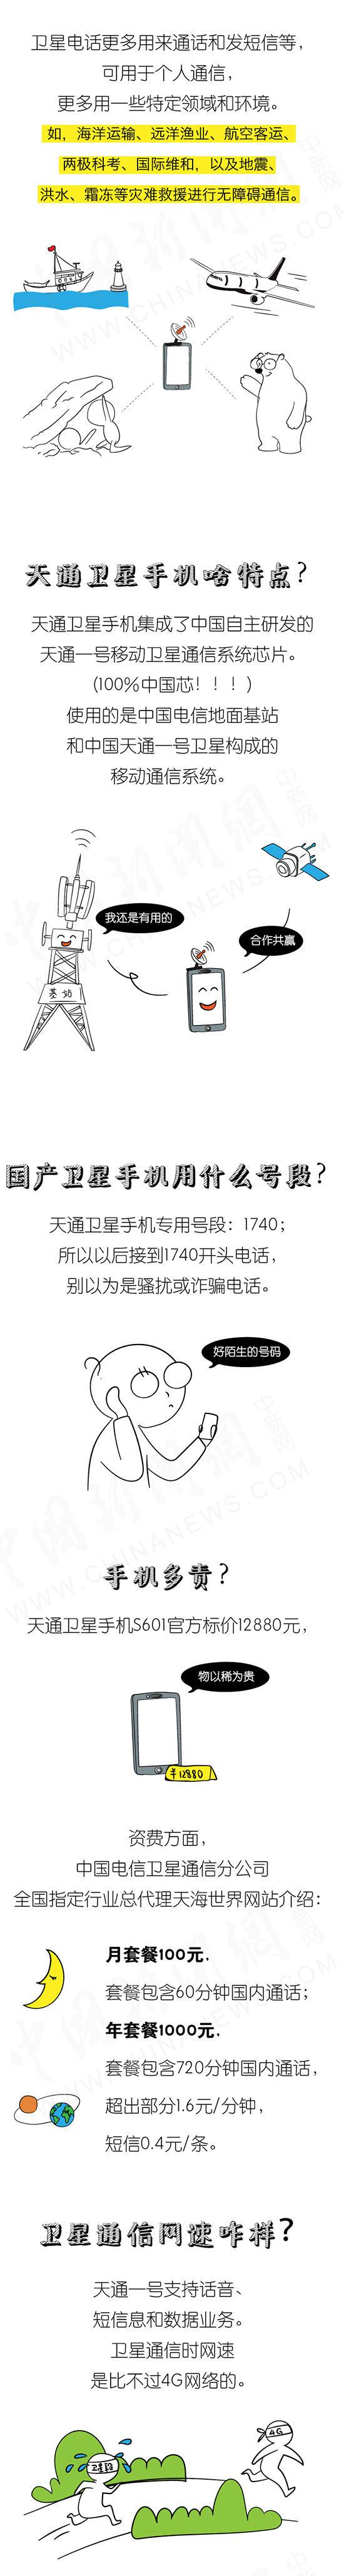 pk10如何找冠军规律:图解:涨知识|卫星手机是什么?